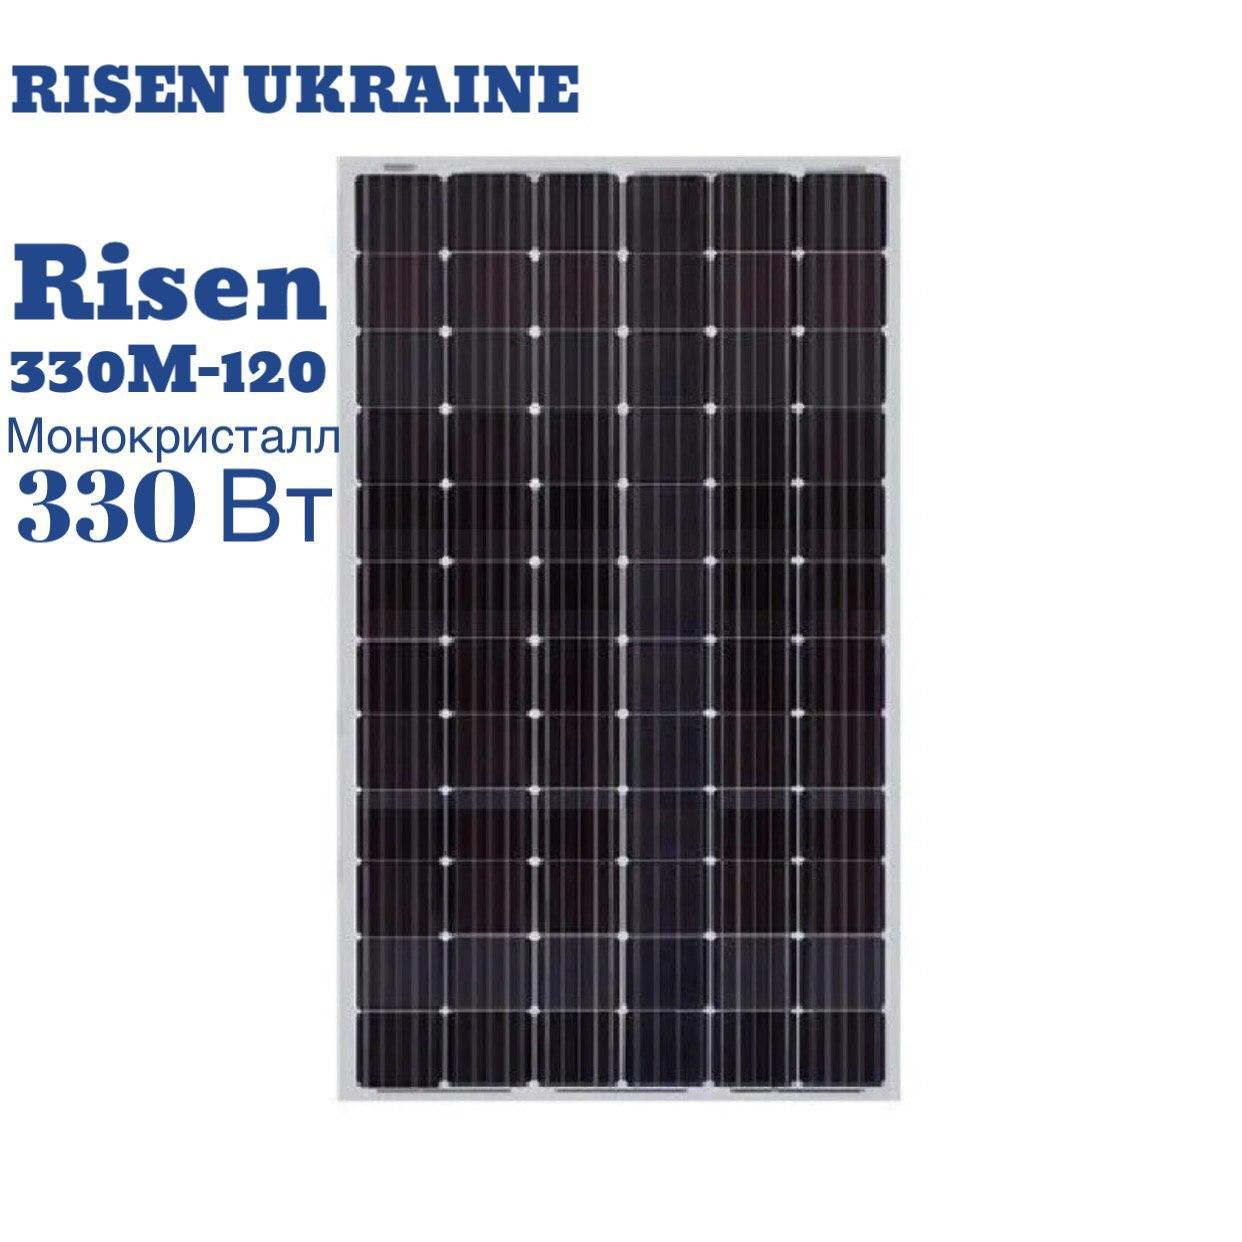 Солнечная батарея Risen 330M-120 монокристалл 330Вт